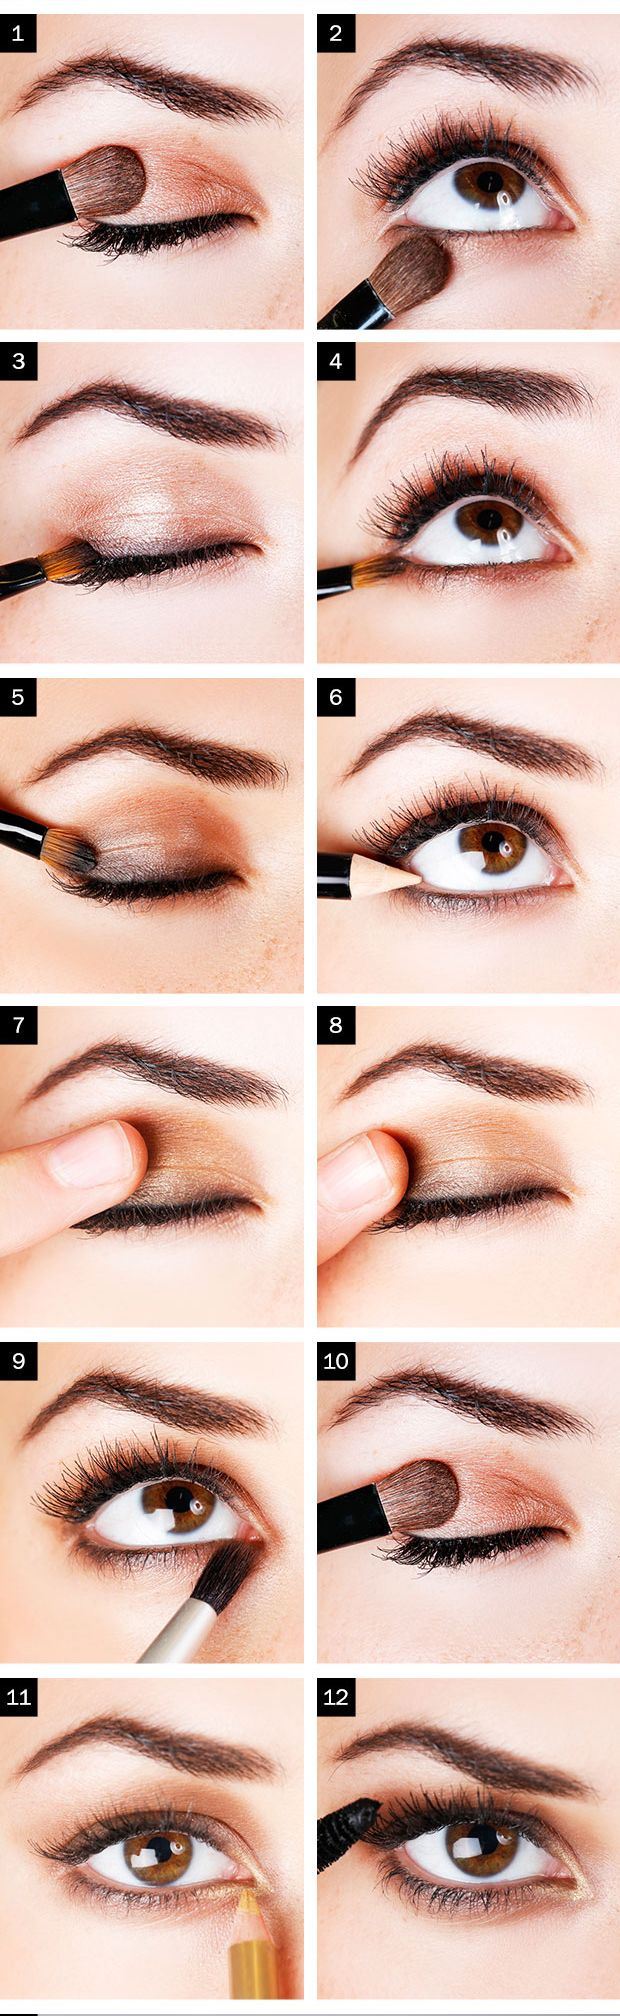 Makeup Howto: Bronze Smoky Eye